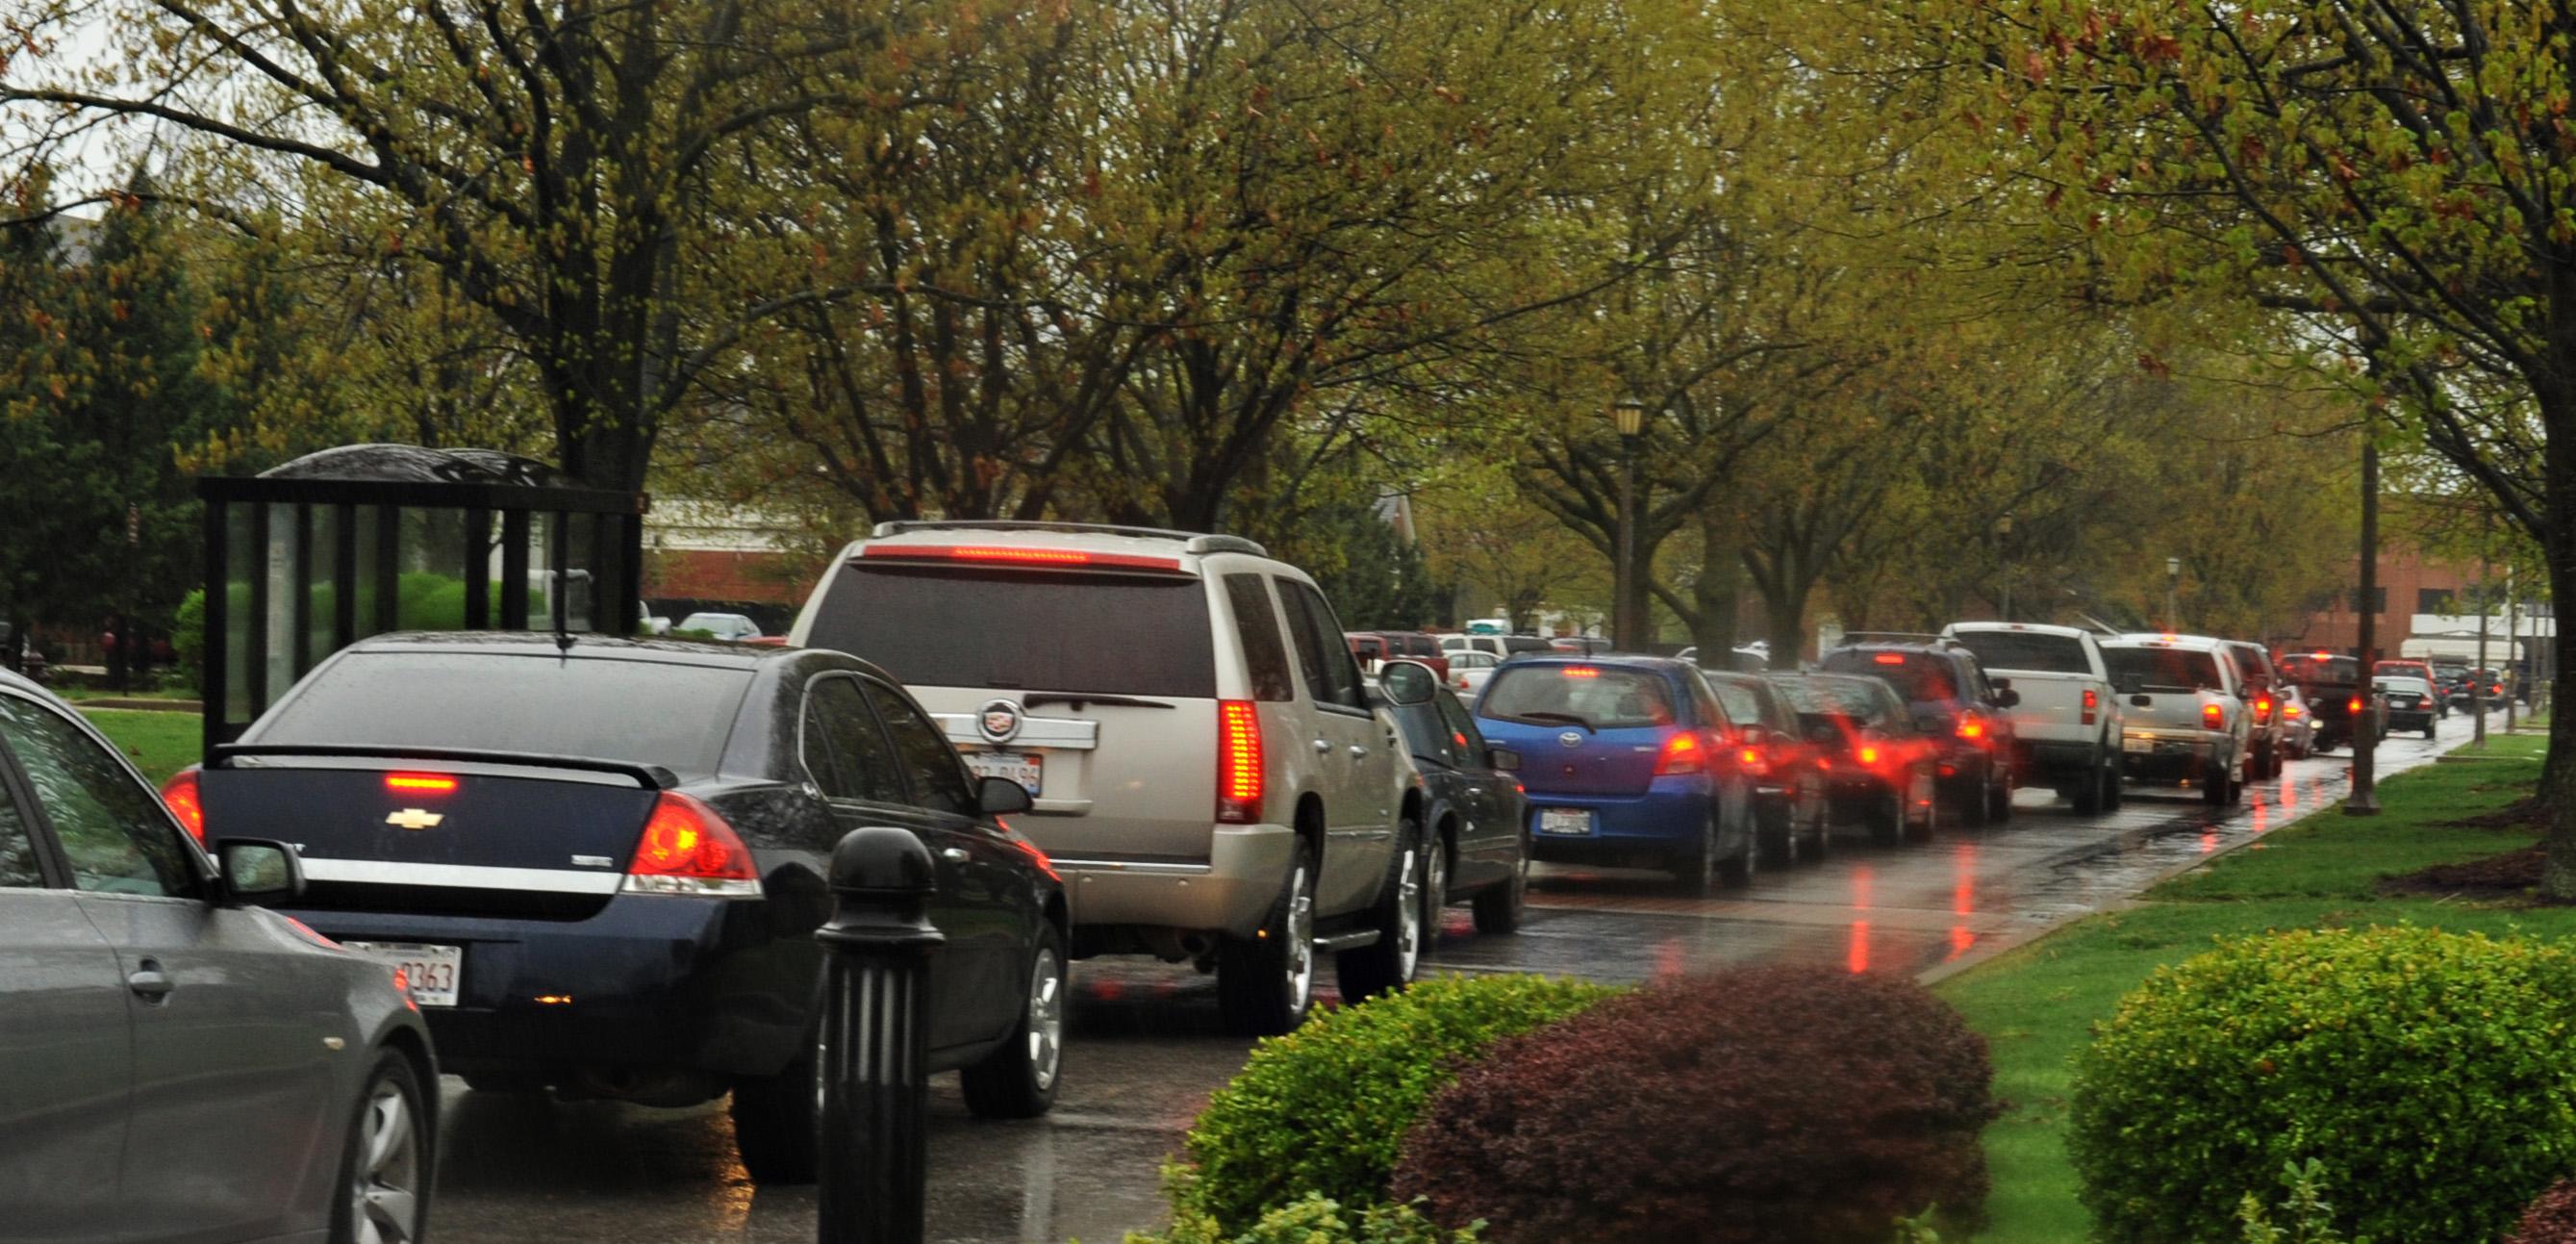 car ban outside schools - air pollution - air quality monitoring